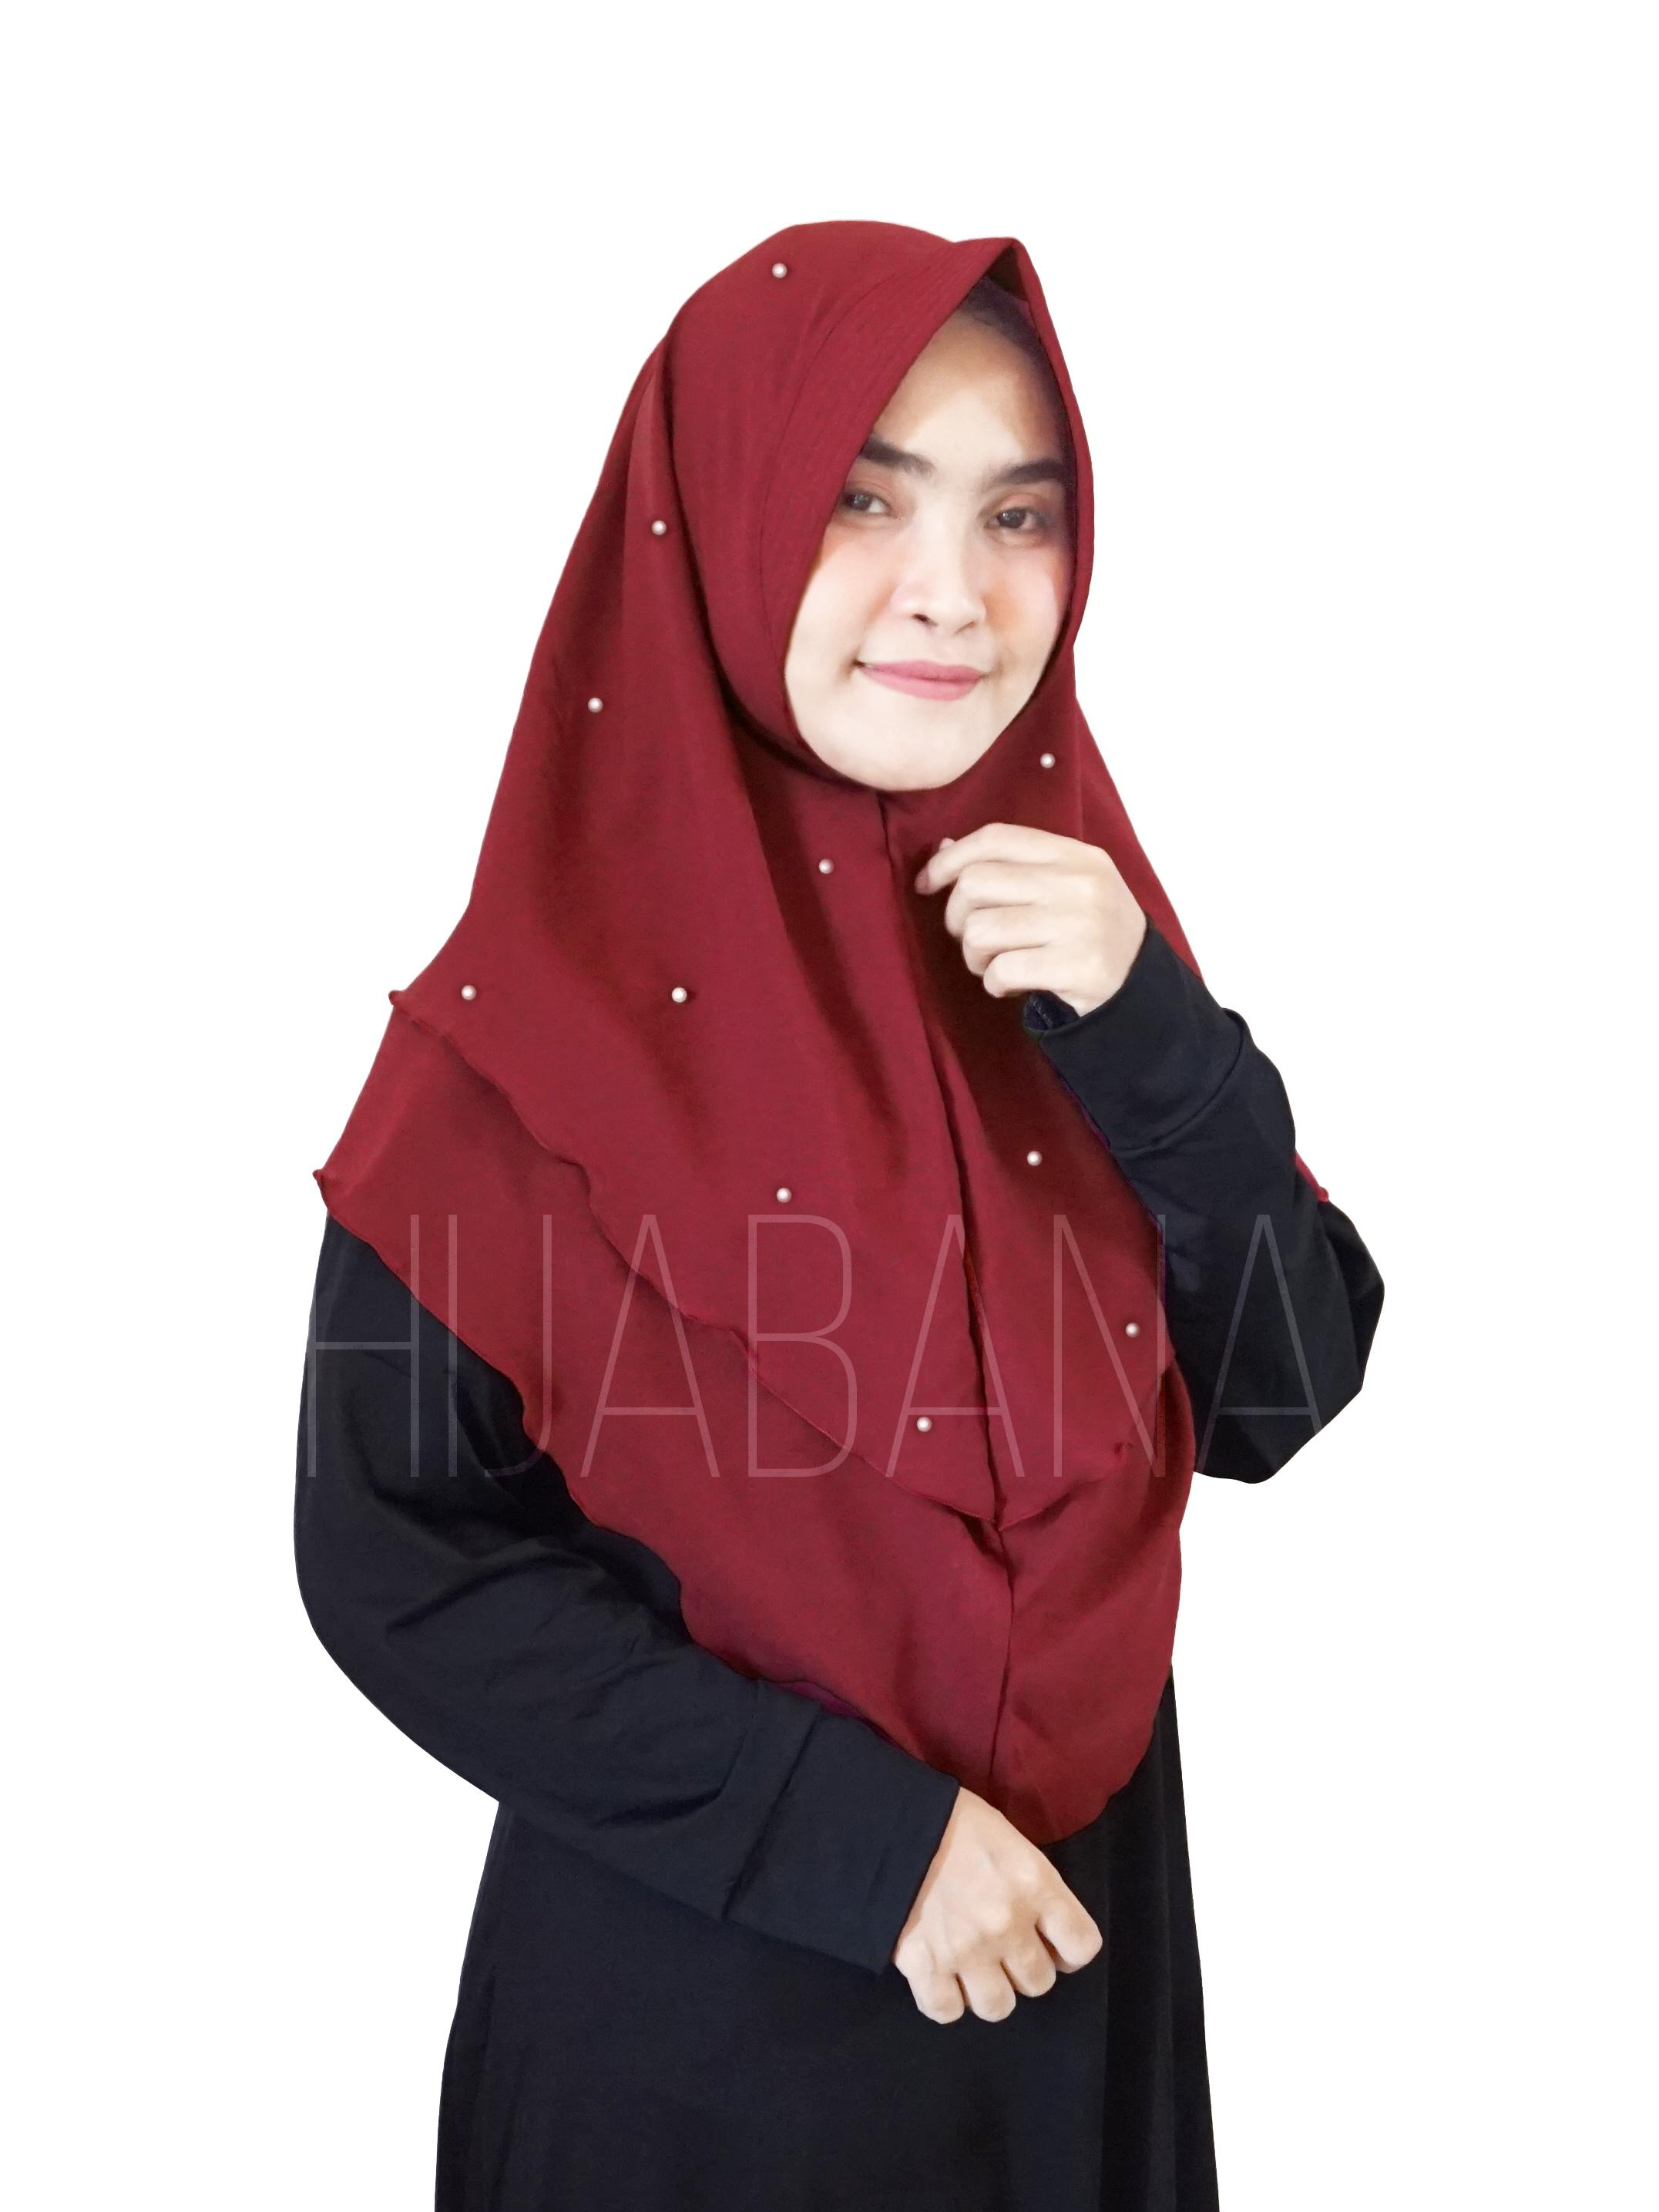 HIJABANA Hijab Instan Thalia Pearl 2 Layer Ped Pad - Kerudung Pesta 2 lapis - Jilbab Instan Pesta Mutiara - Hijab Swarosky